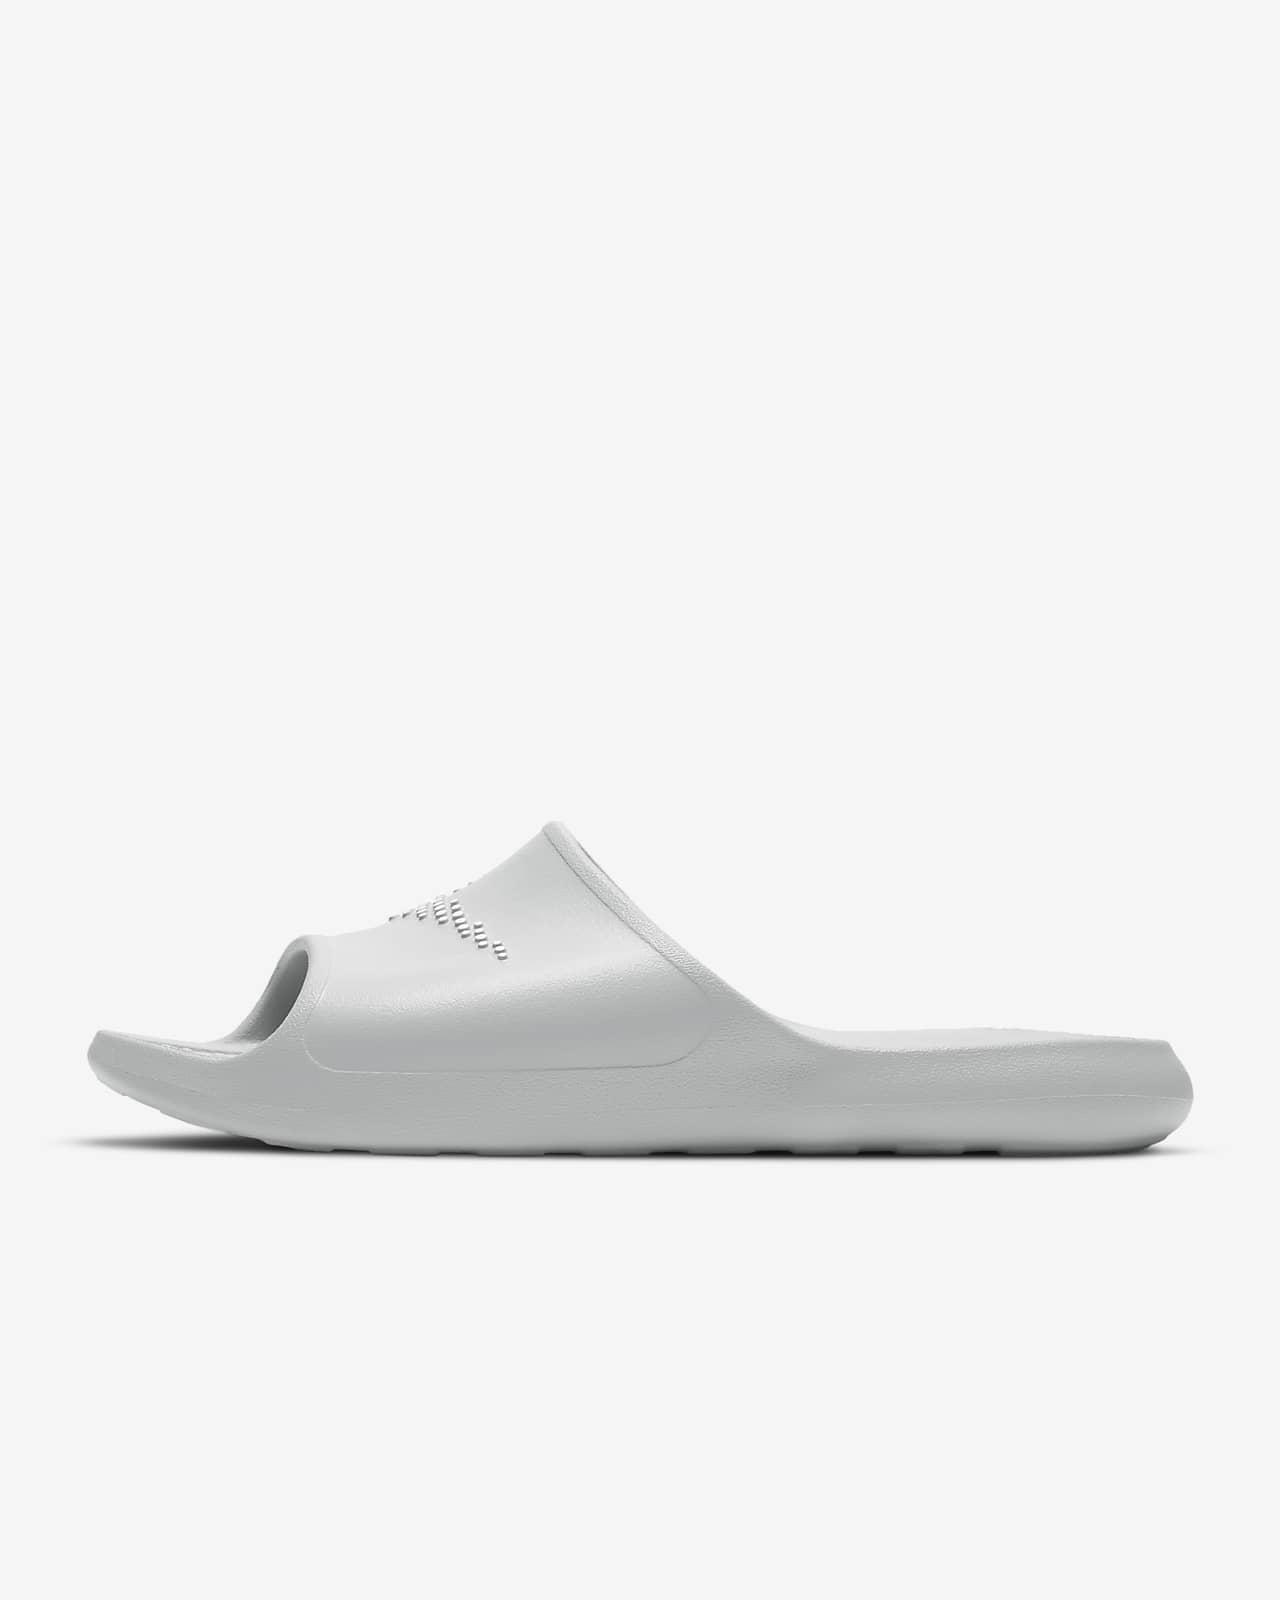 Nike Victori One férfipapucs zuhanyzáshoz